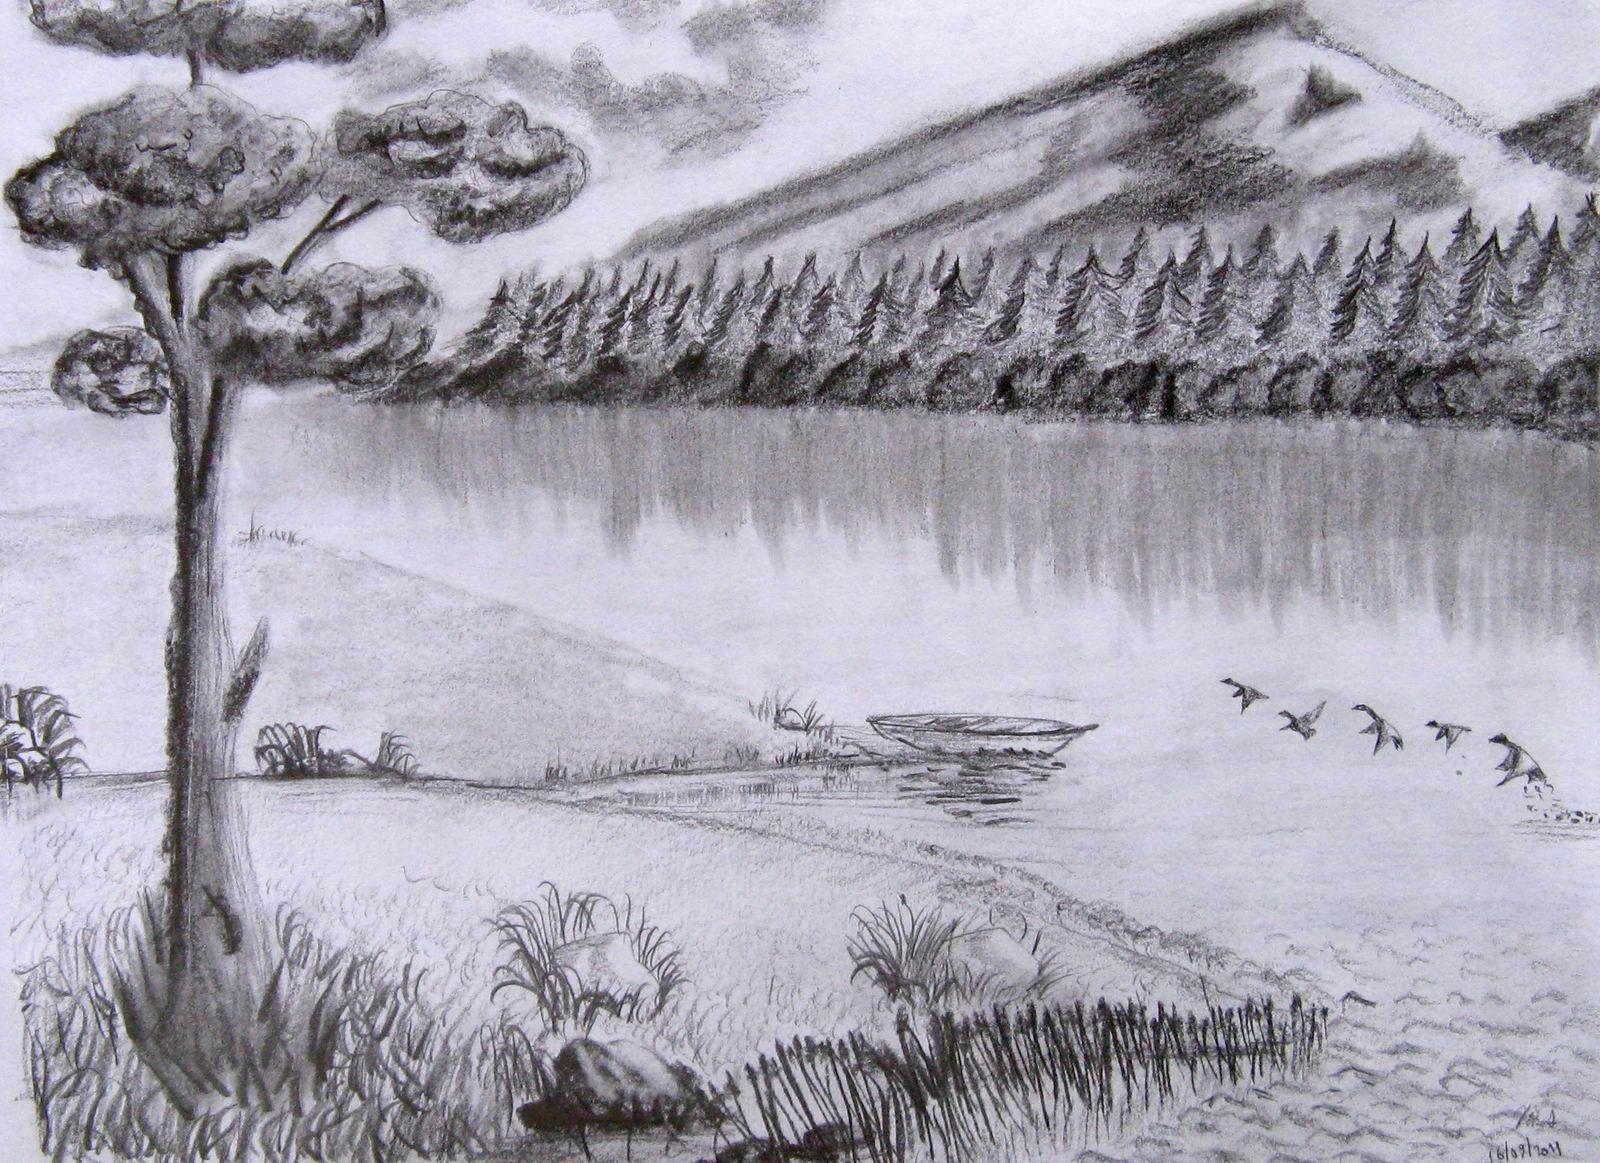 Karakalem Calismalari Manzara Kolay En Yeniler En Iyiler Manzara Sanat Egitimi Sanat